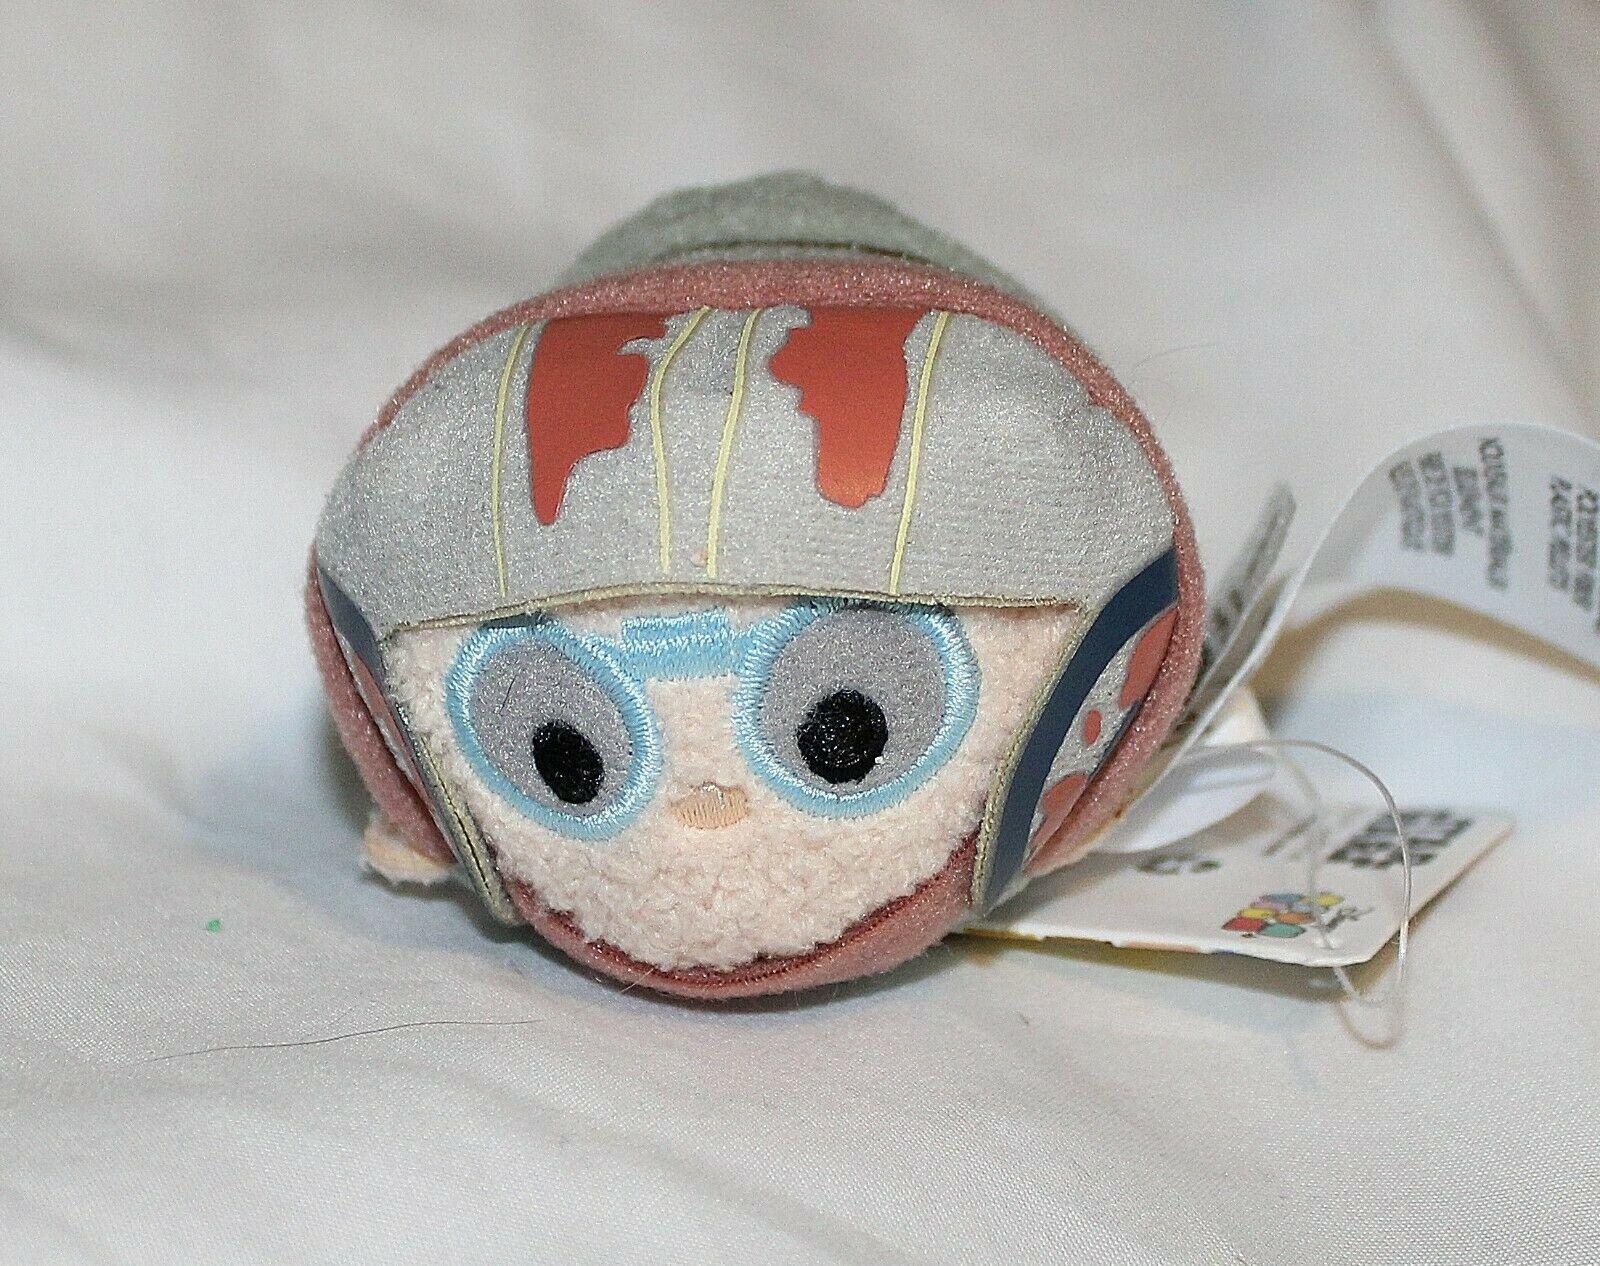 New Star Wars Tsum Tsum Young Anakin Skywalker Plush Phantom Menace